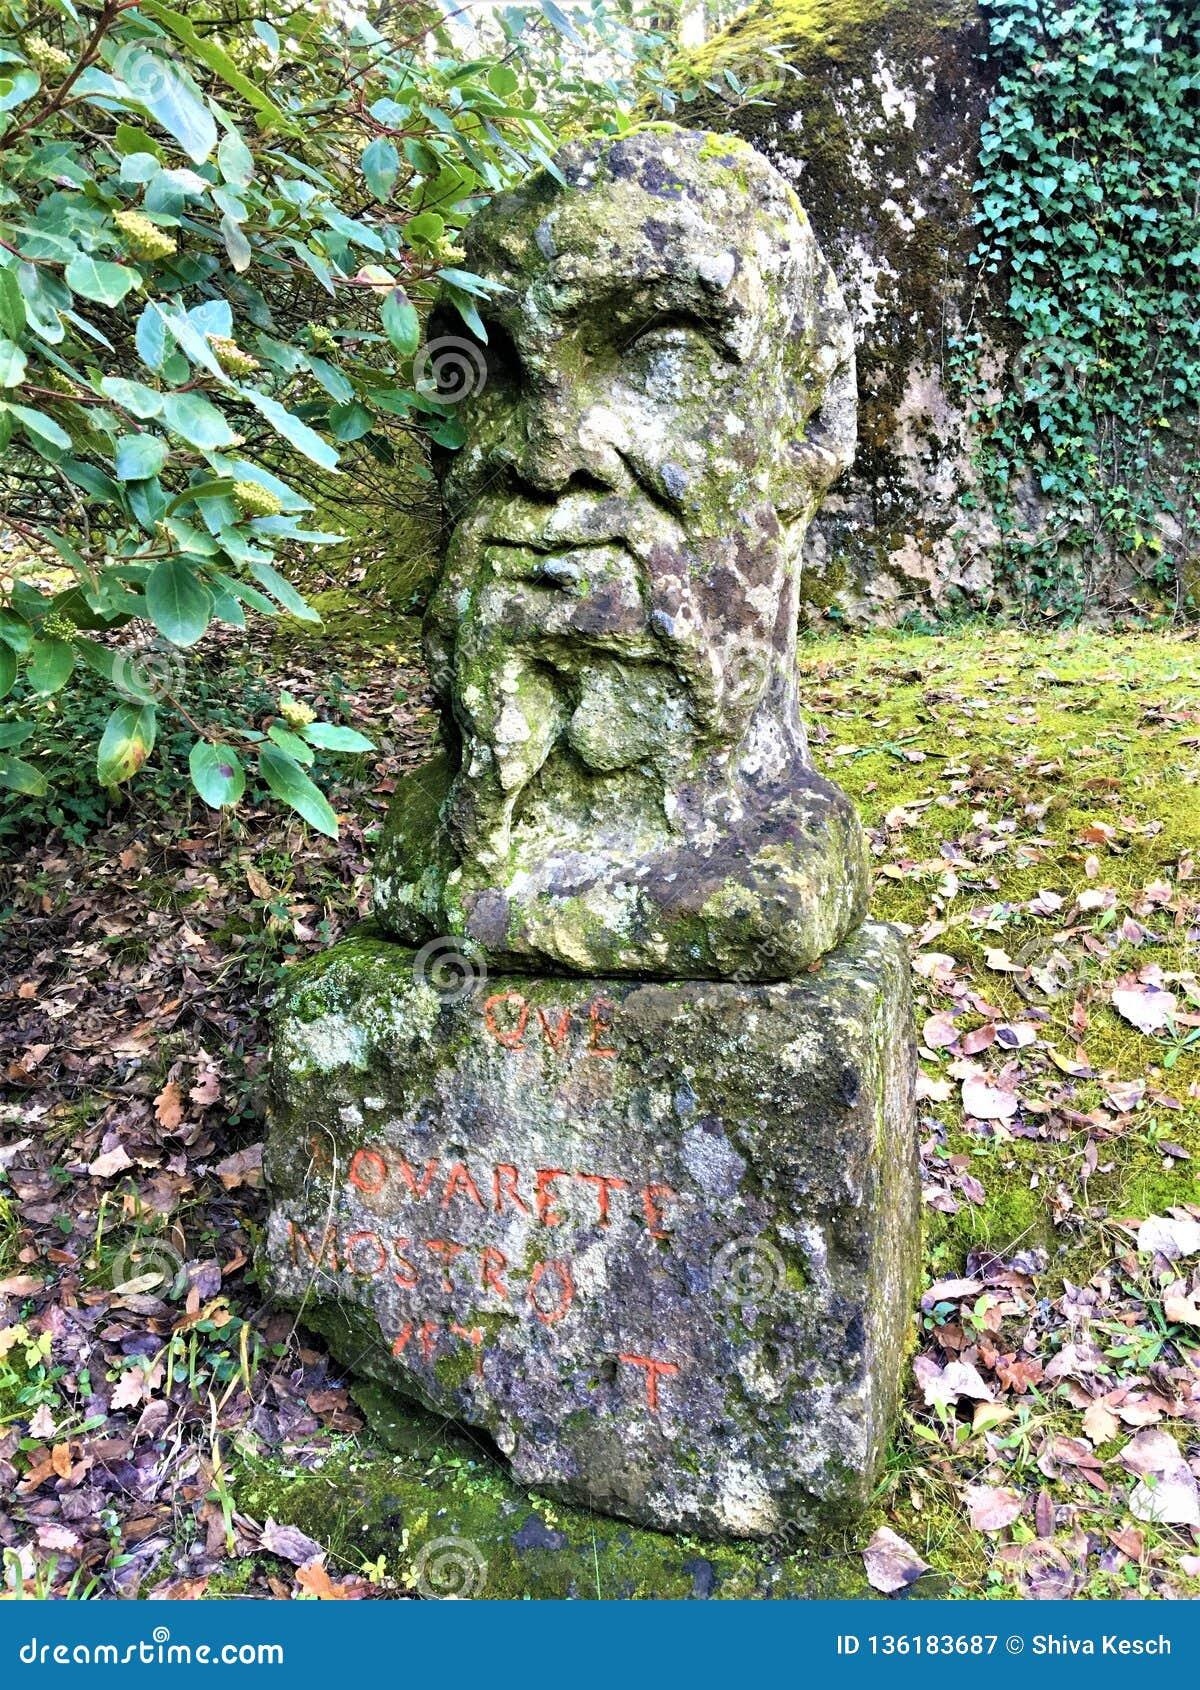 Park potwory, Święty gaj, ogród Bomarzo Pier Francesco Orsini i jego statuy